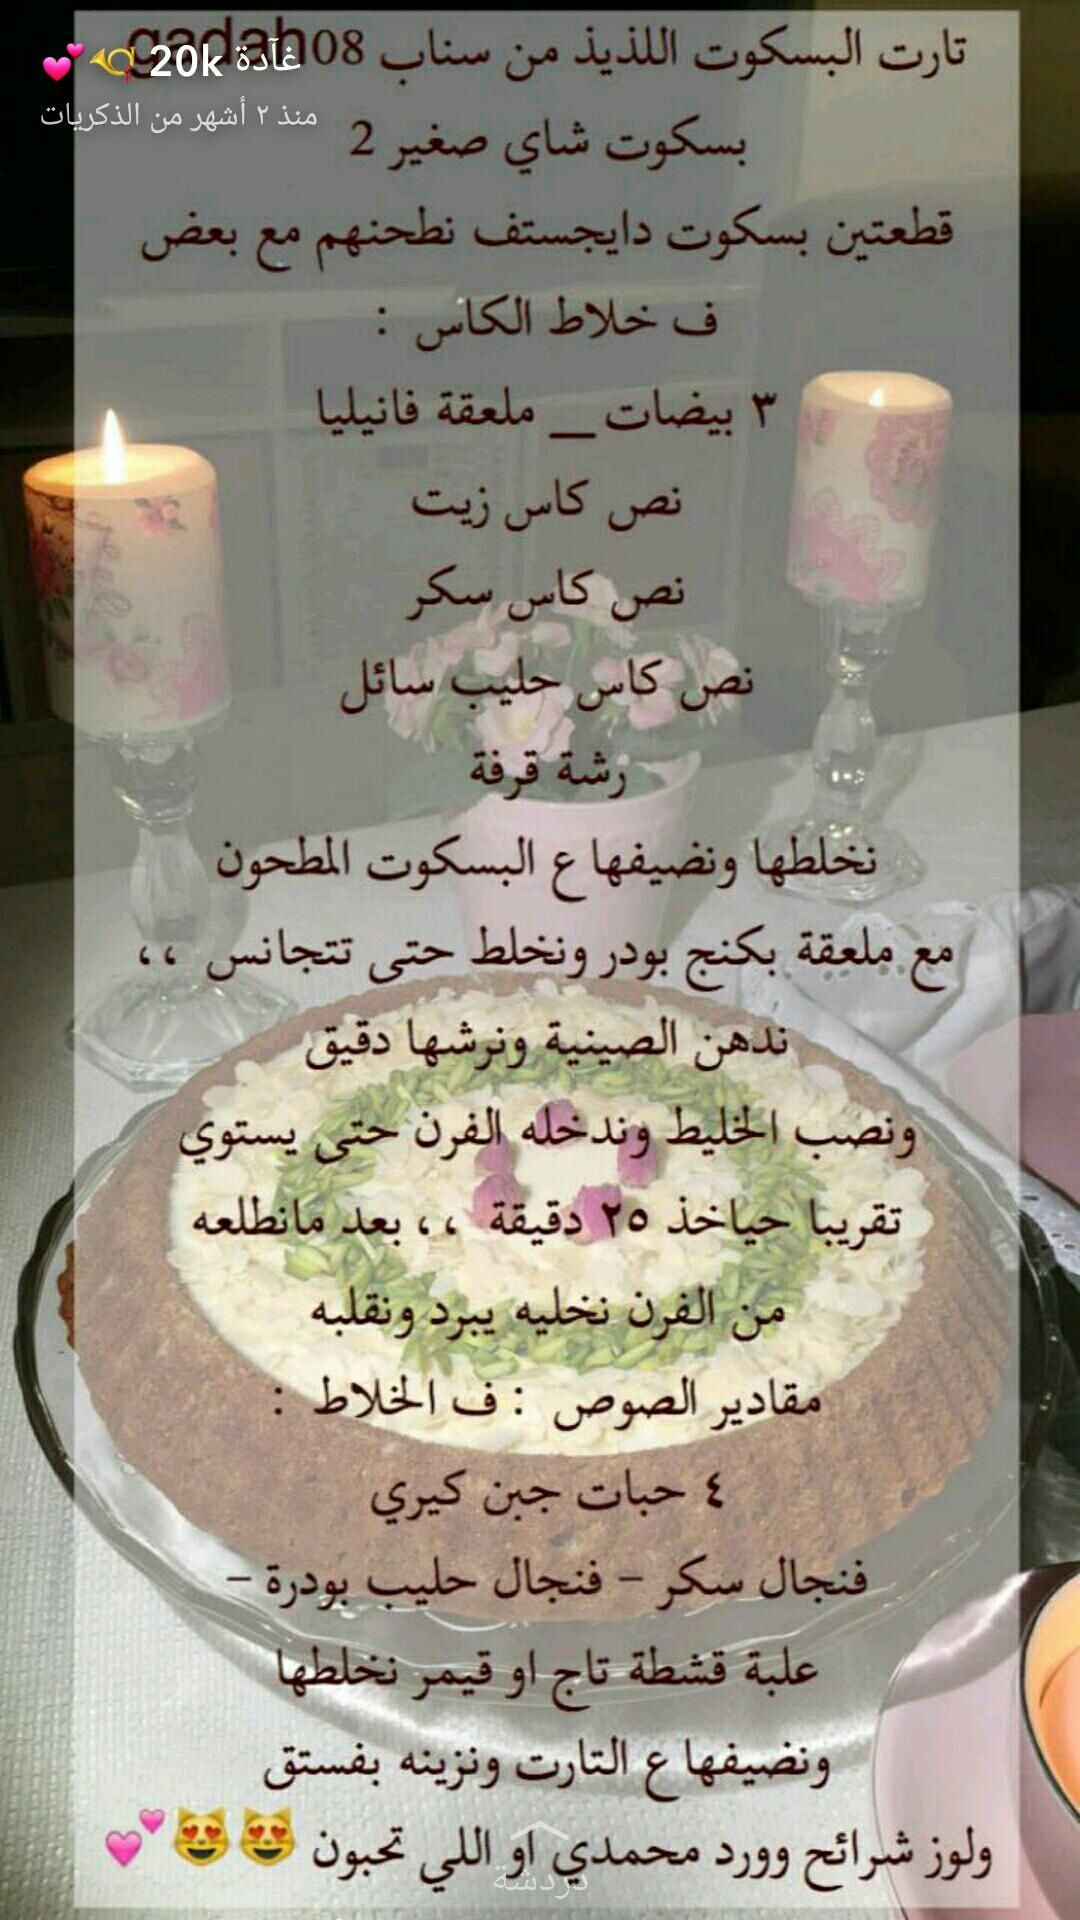 تارت البسكوت Food And Drink Sweets Desserts